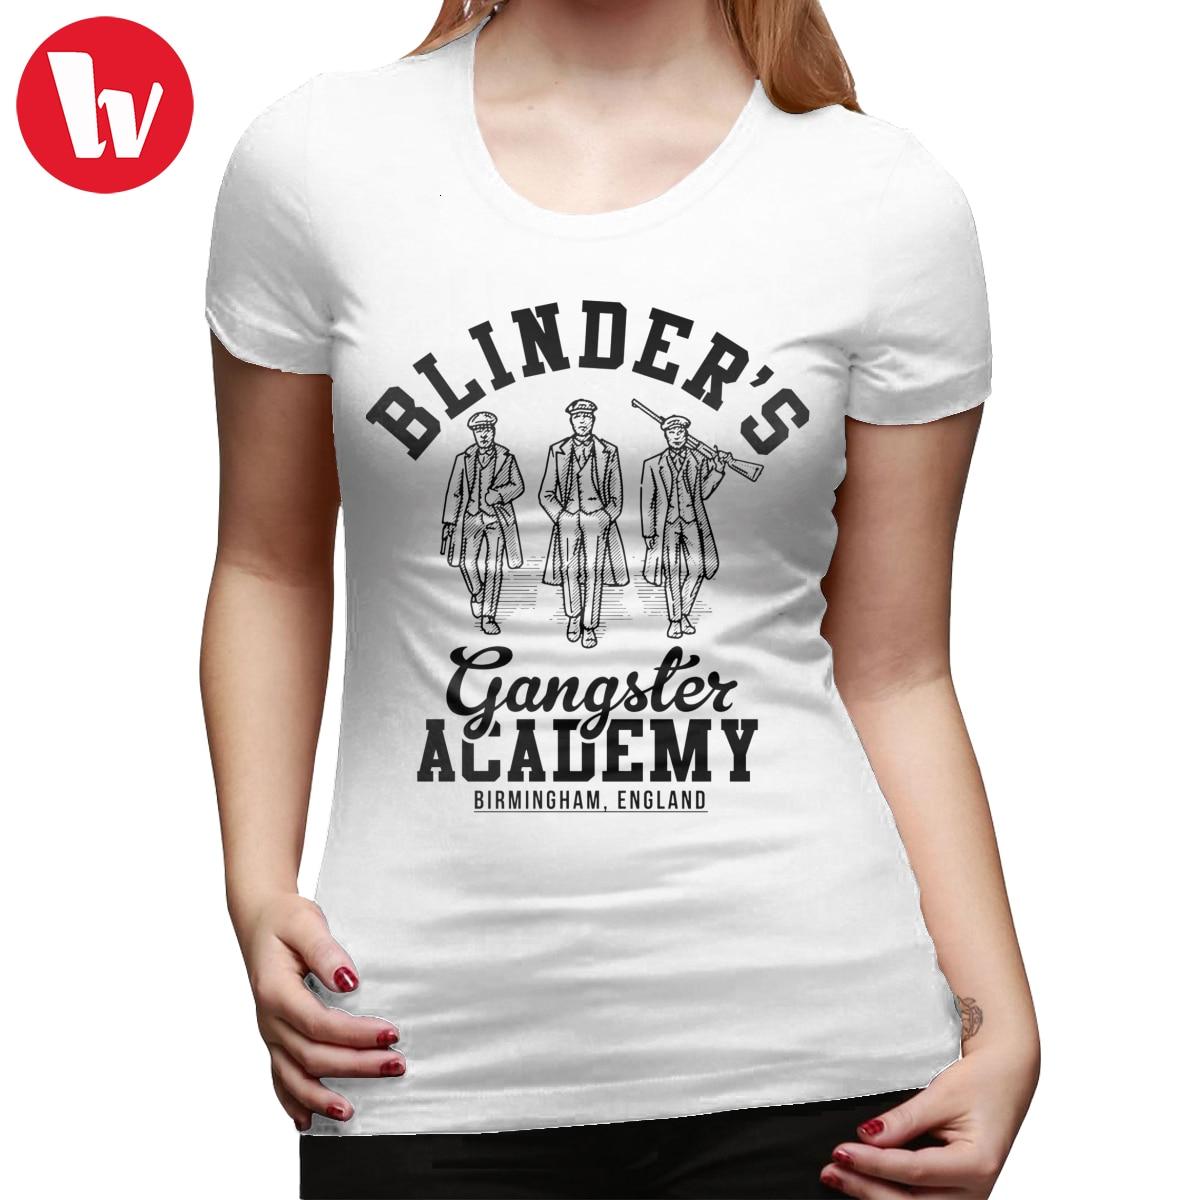 Peaky Blinders camiseta Peaky Blinders gángster Academy Birmingham Inglaterra camiseta patrón púrpura mujeres camiseta señoras camiseta